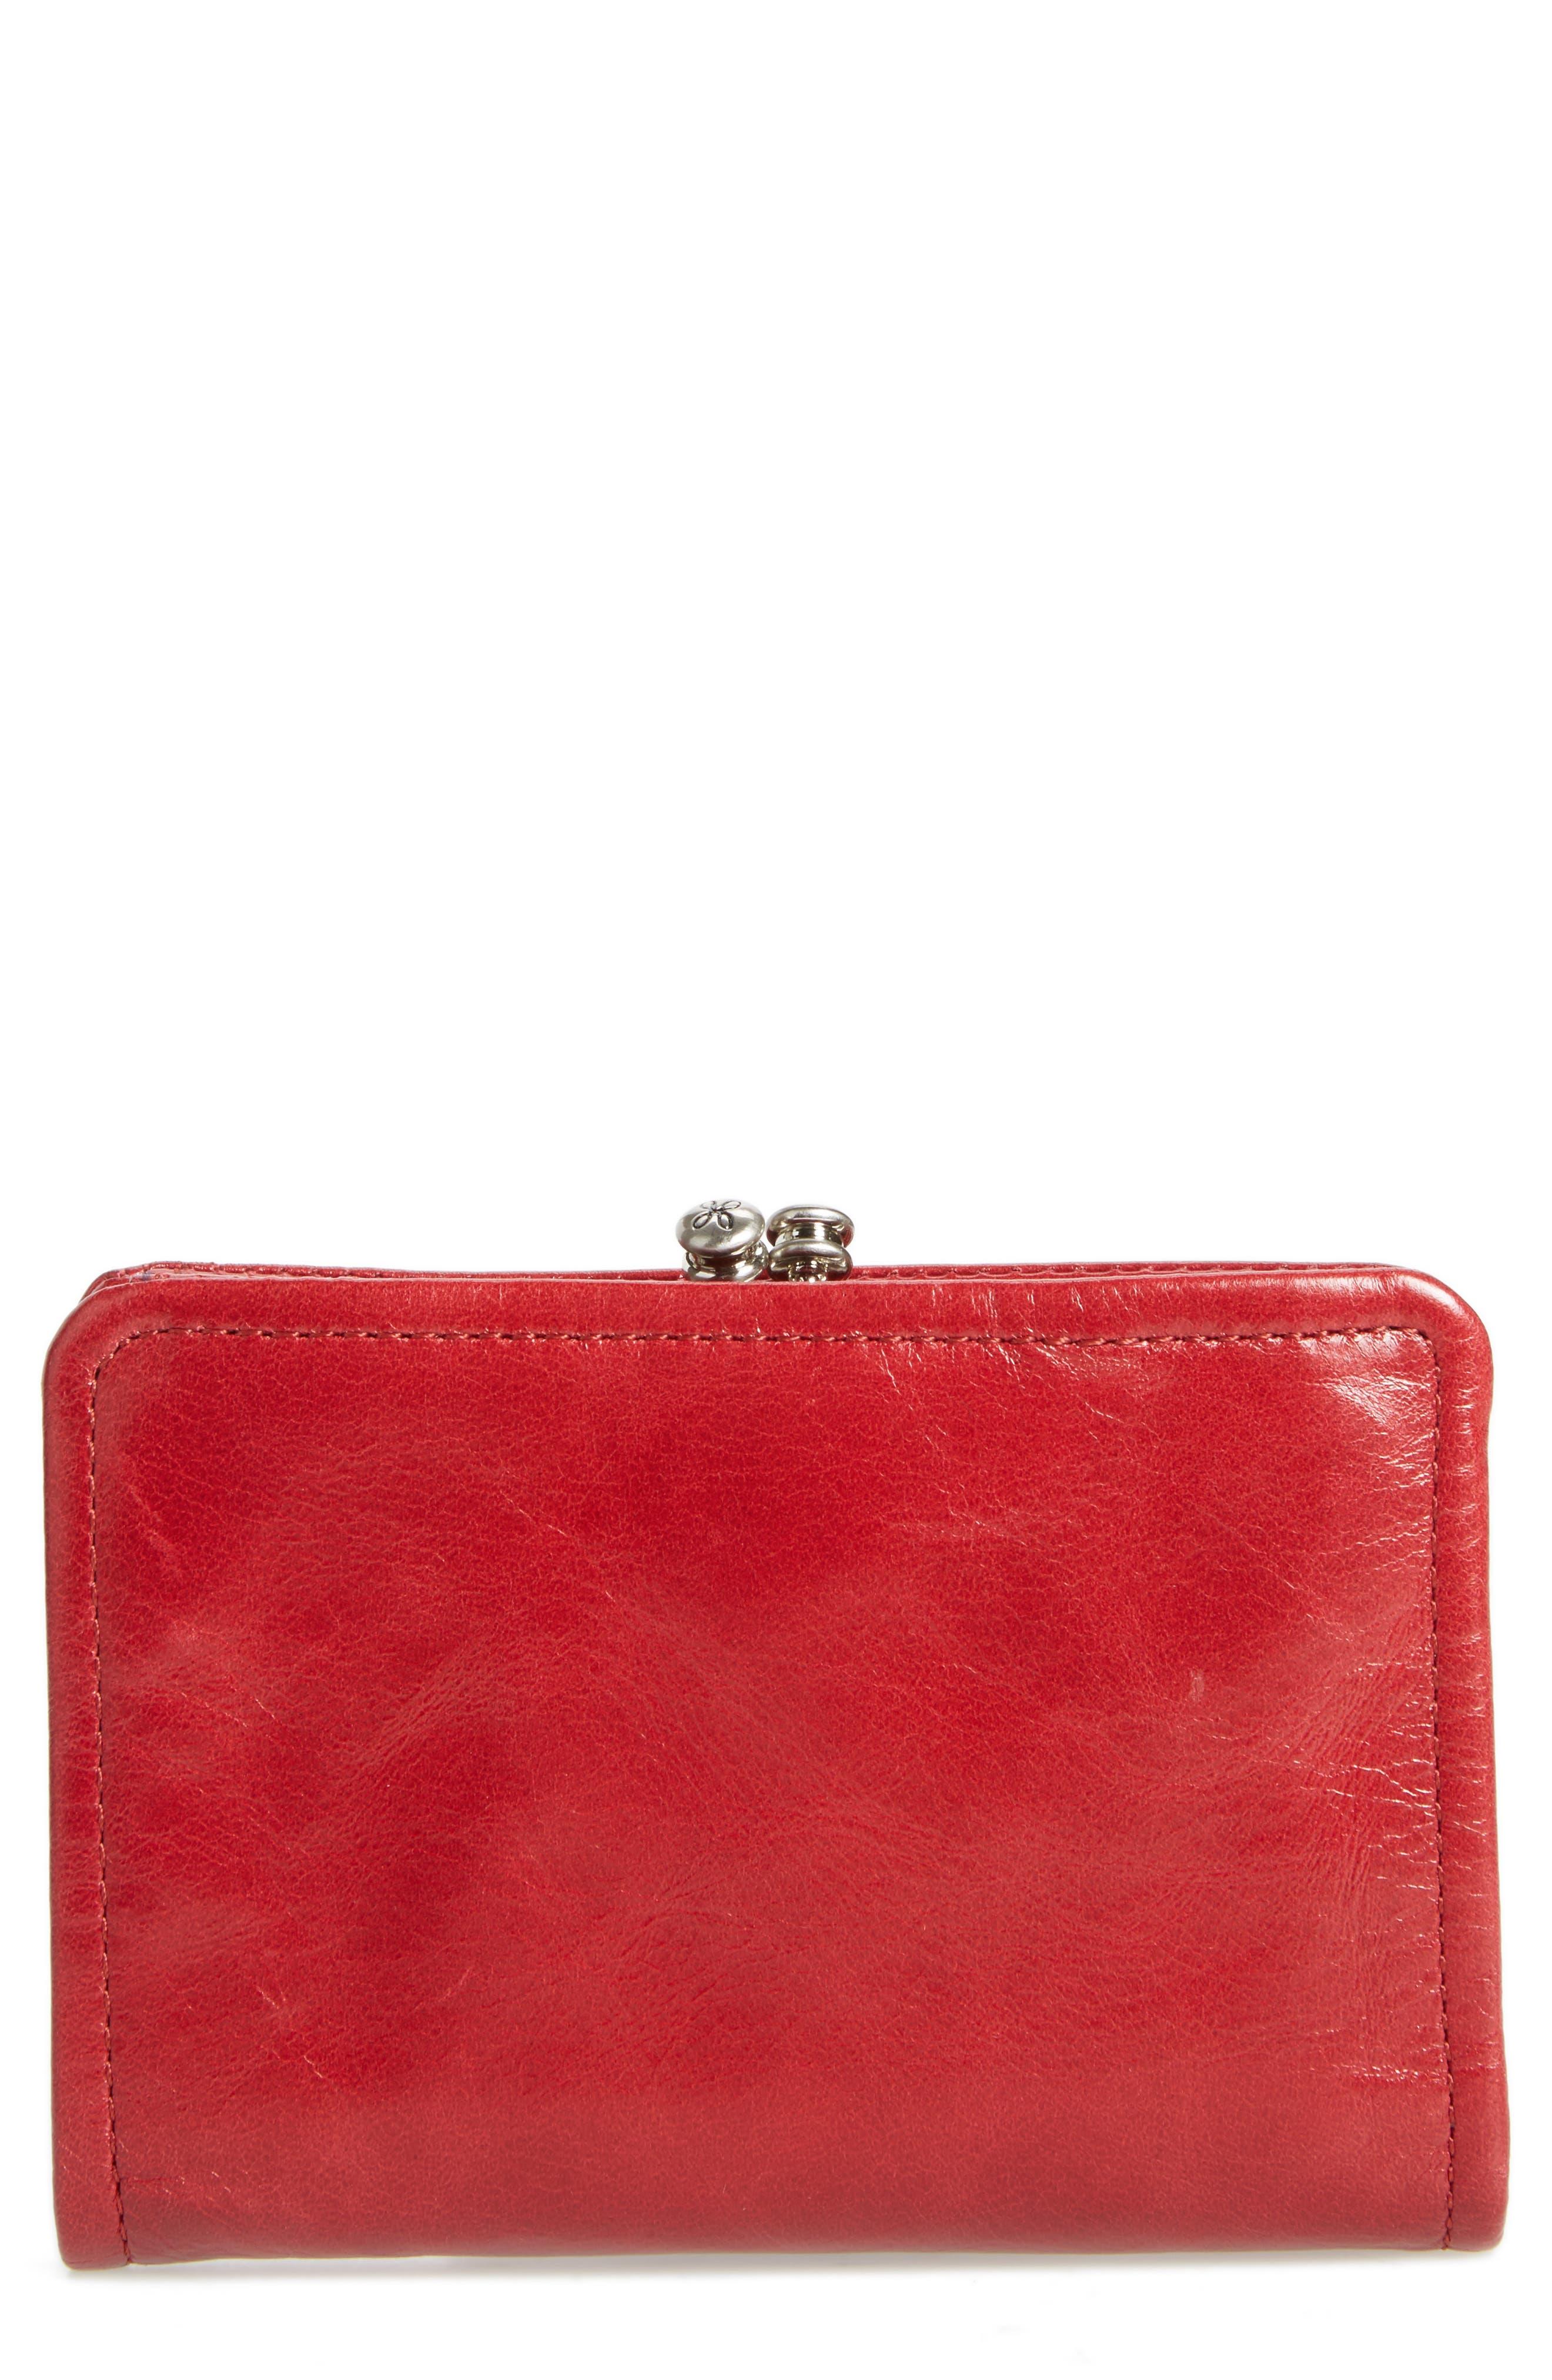 Hobo Delta Calfskin Leather Wallet